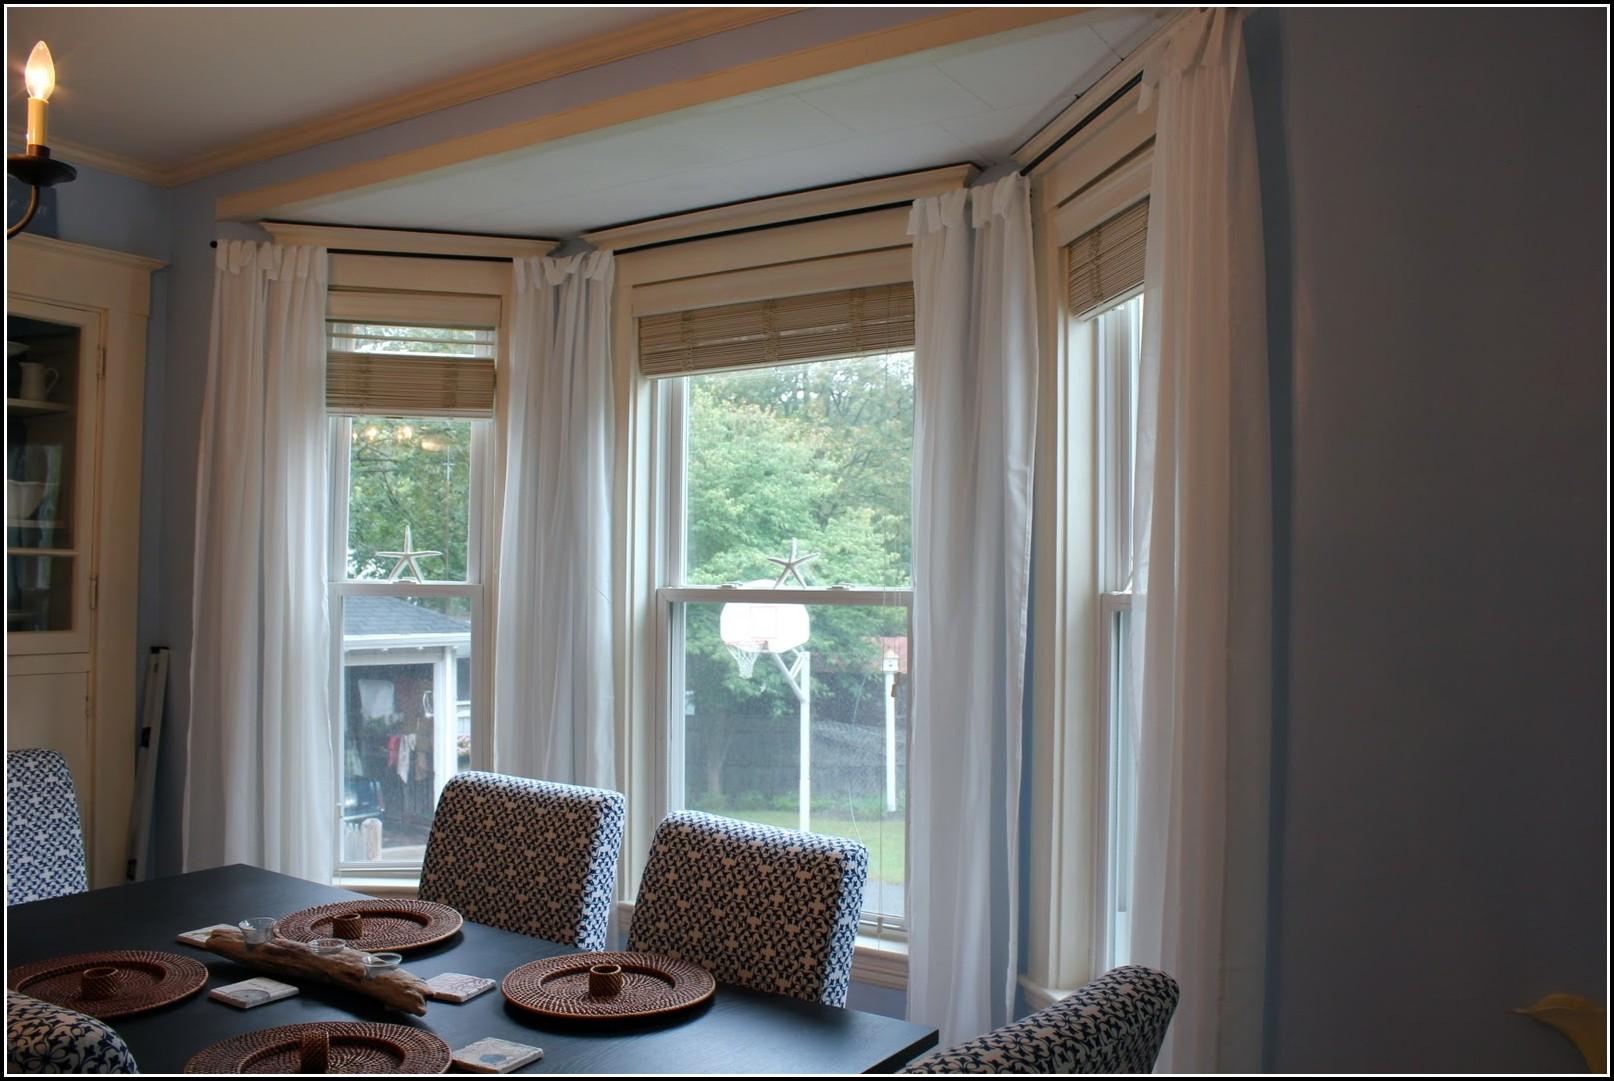 Ceiling Brackets For Curtain Tracks